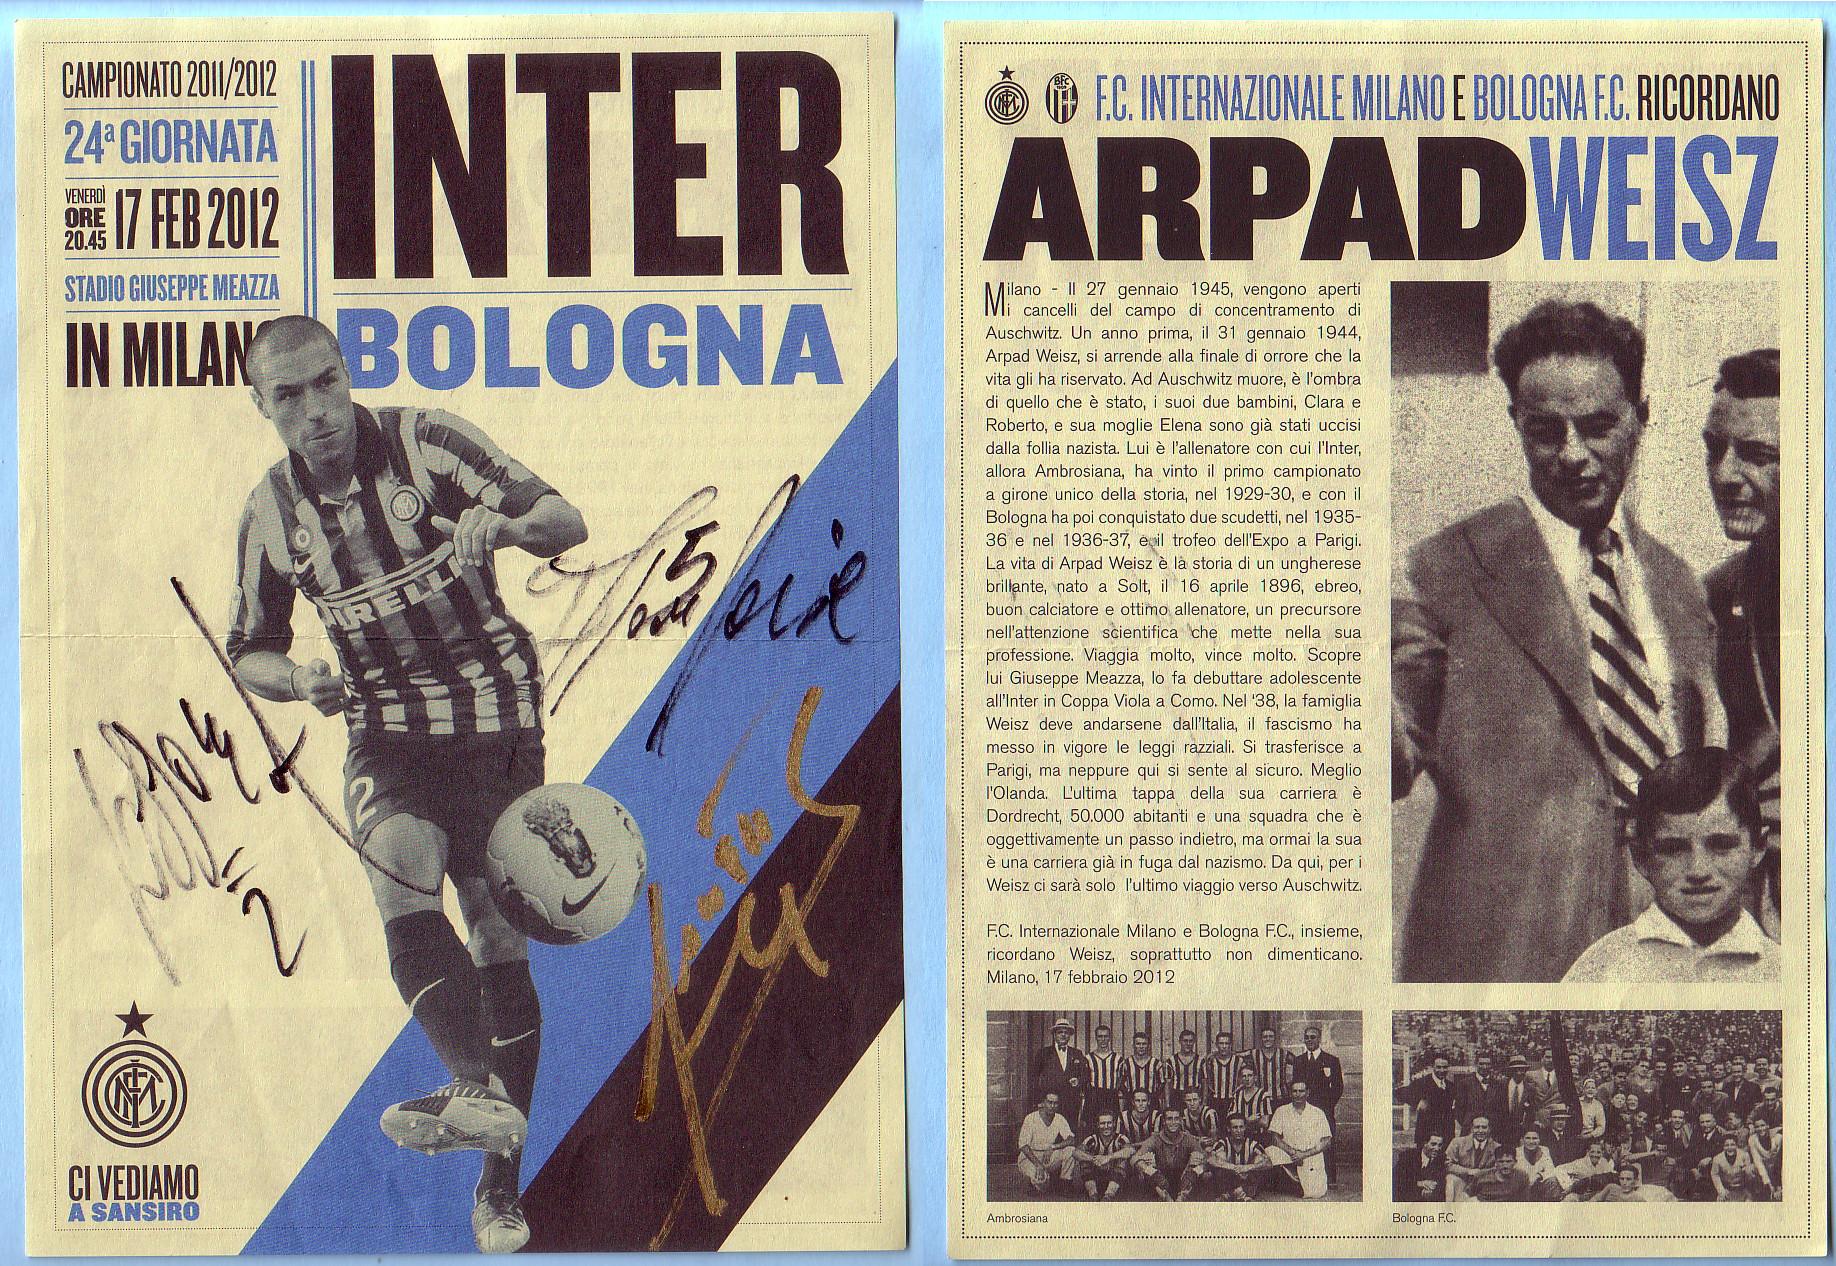 2012-_17-febbraio_-locandina-partita-Inter-Bologna-con-dedica-al-verso-ad-Arp_d-Weisz.jpg